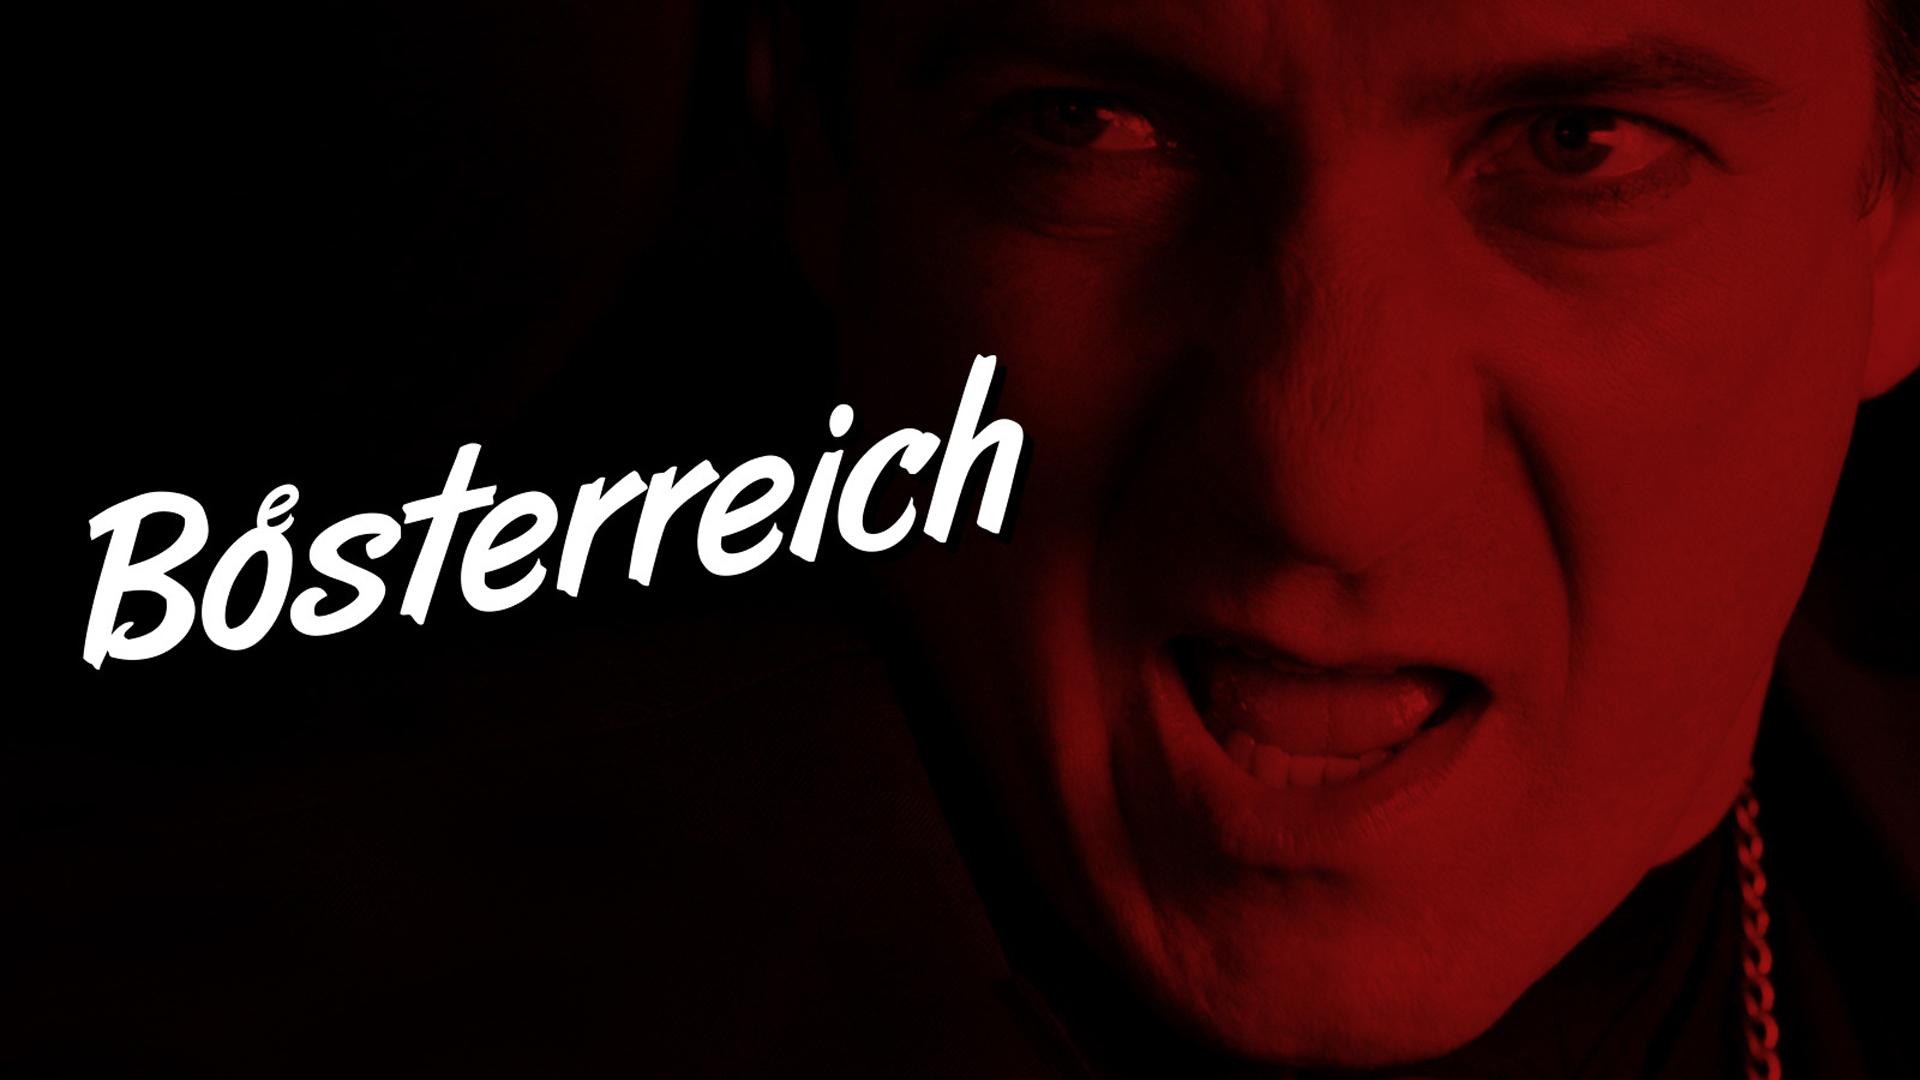 Bosterreich - Staffel 1